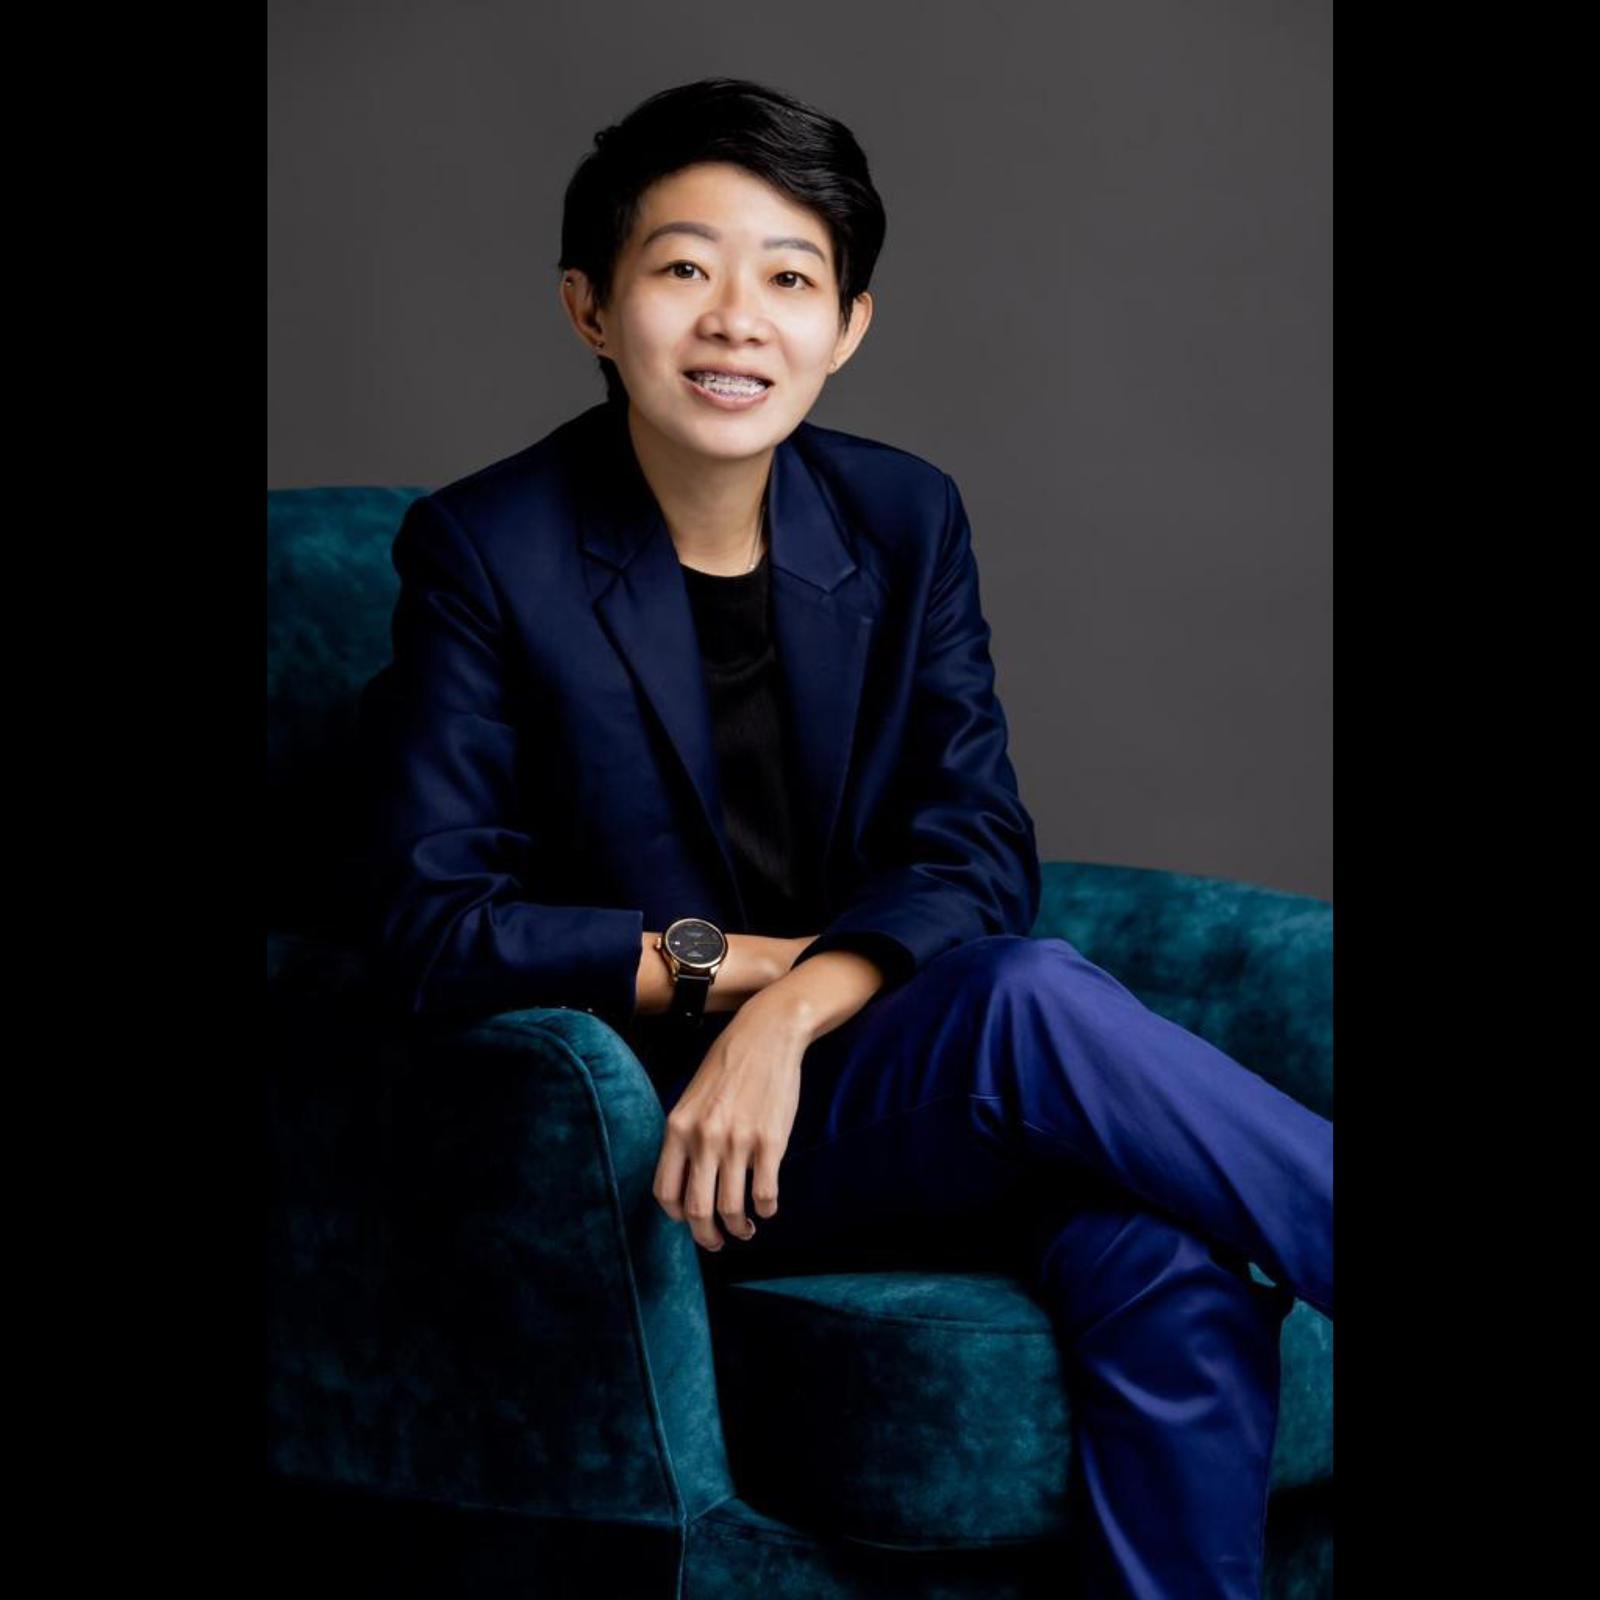 Teo Wei Fen